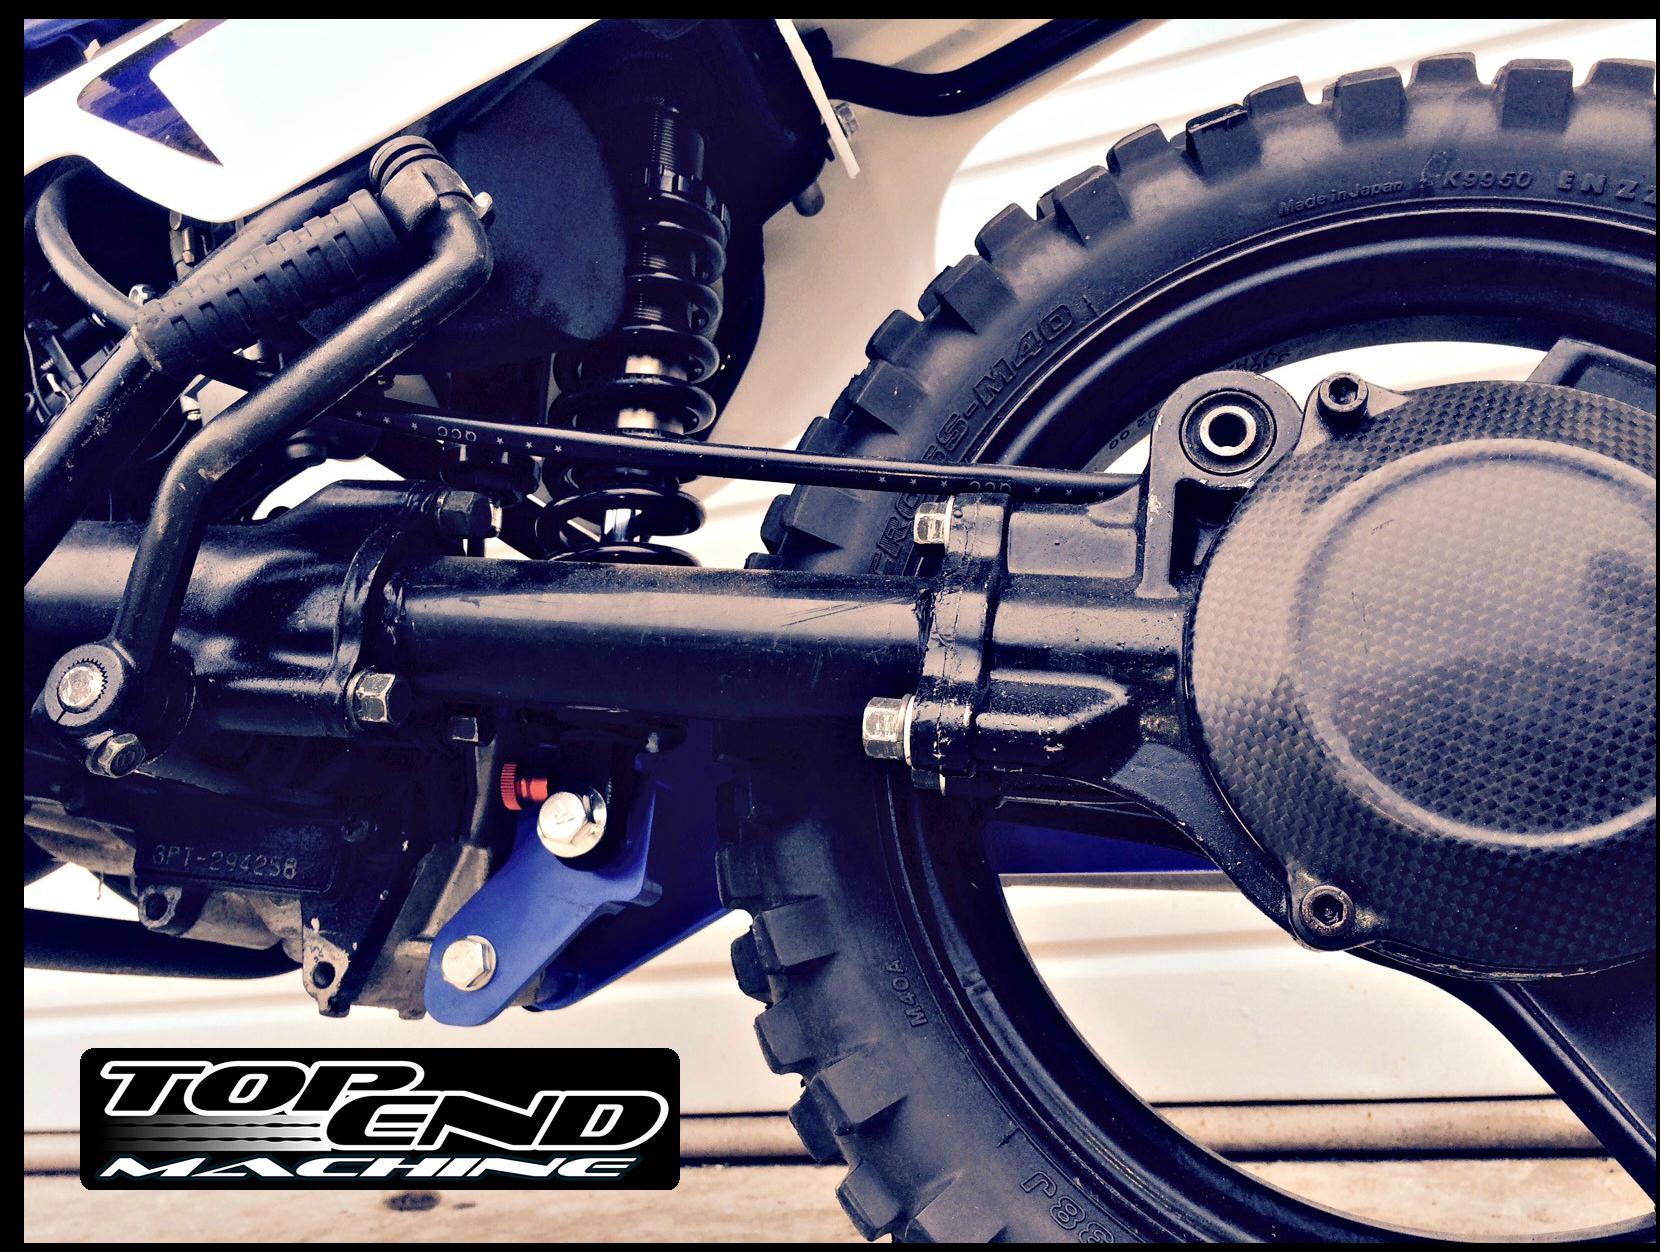 PW50 Single Shock Rear Suspension Kit - Forks optional